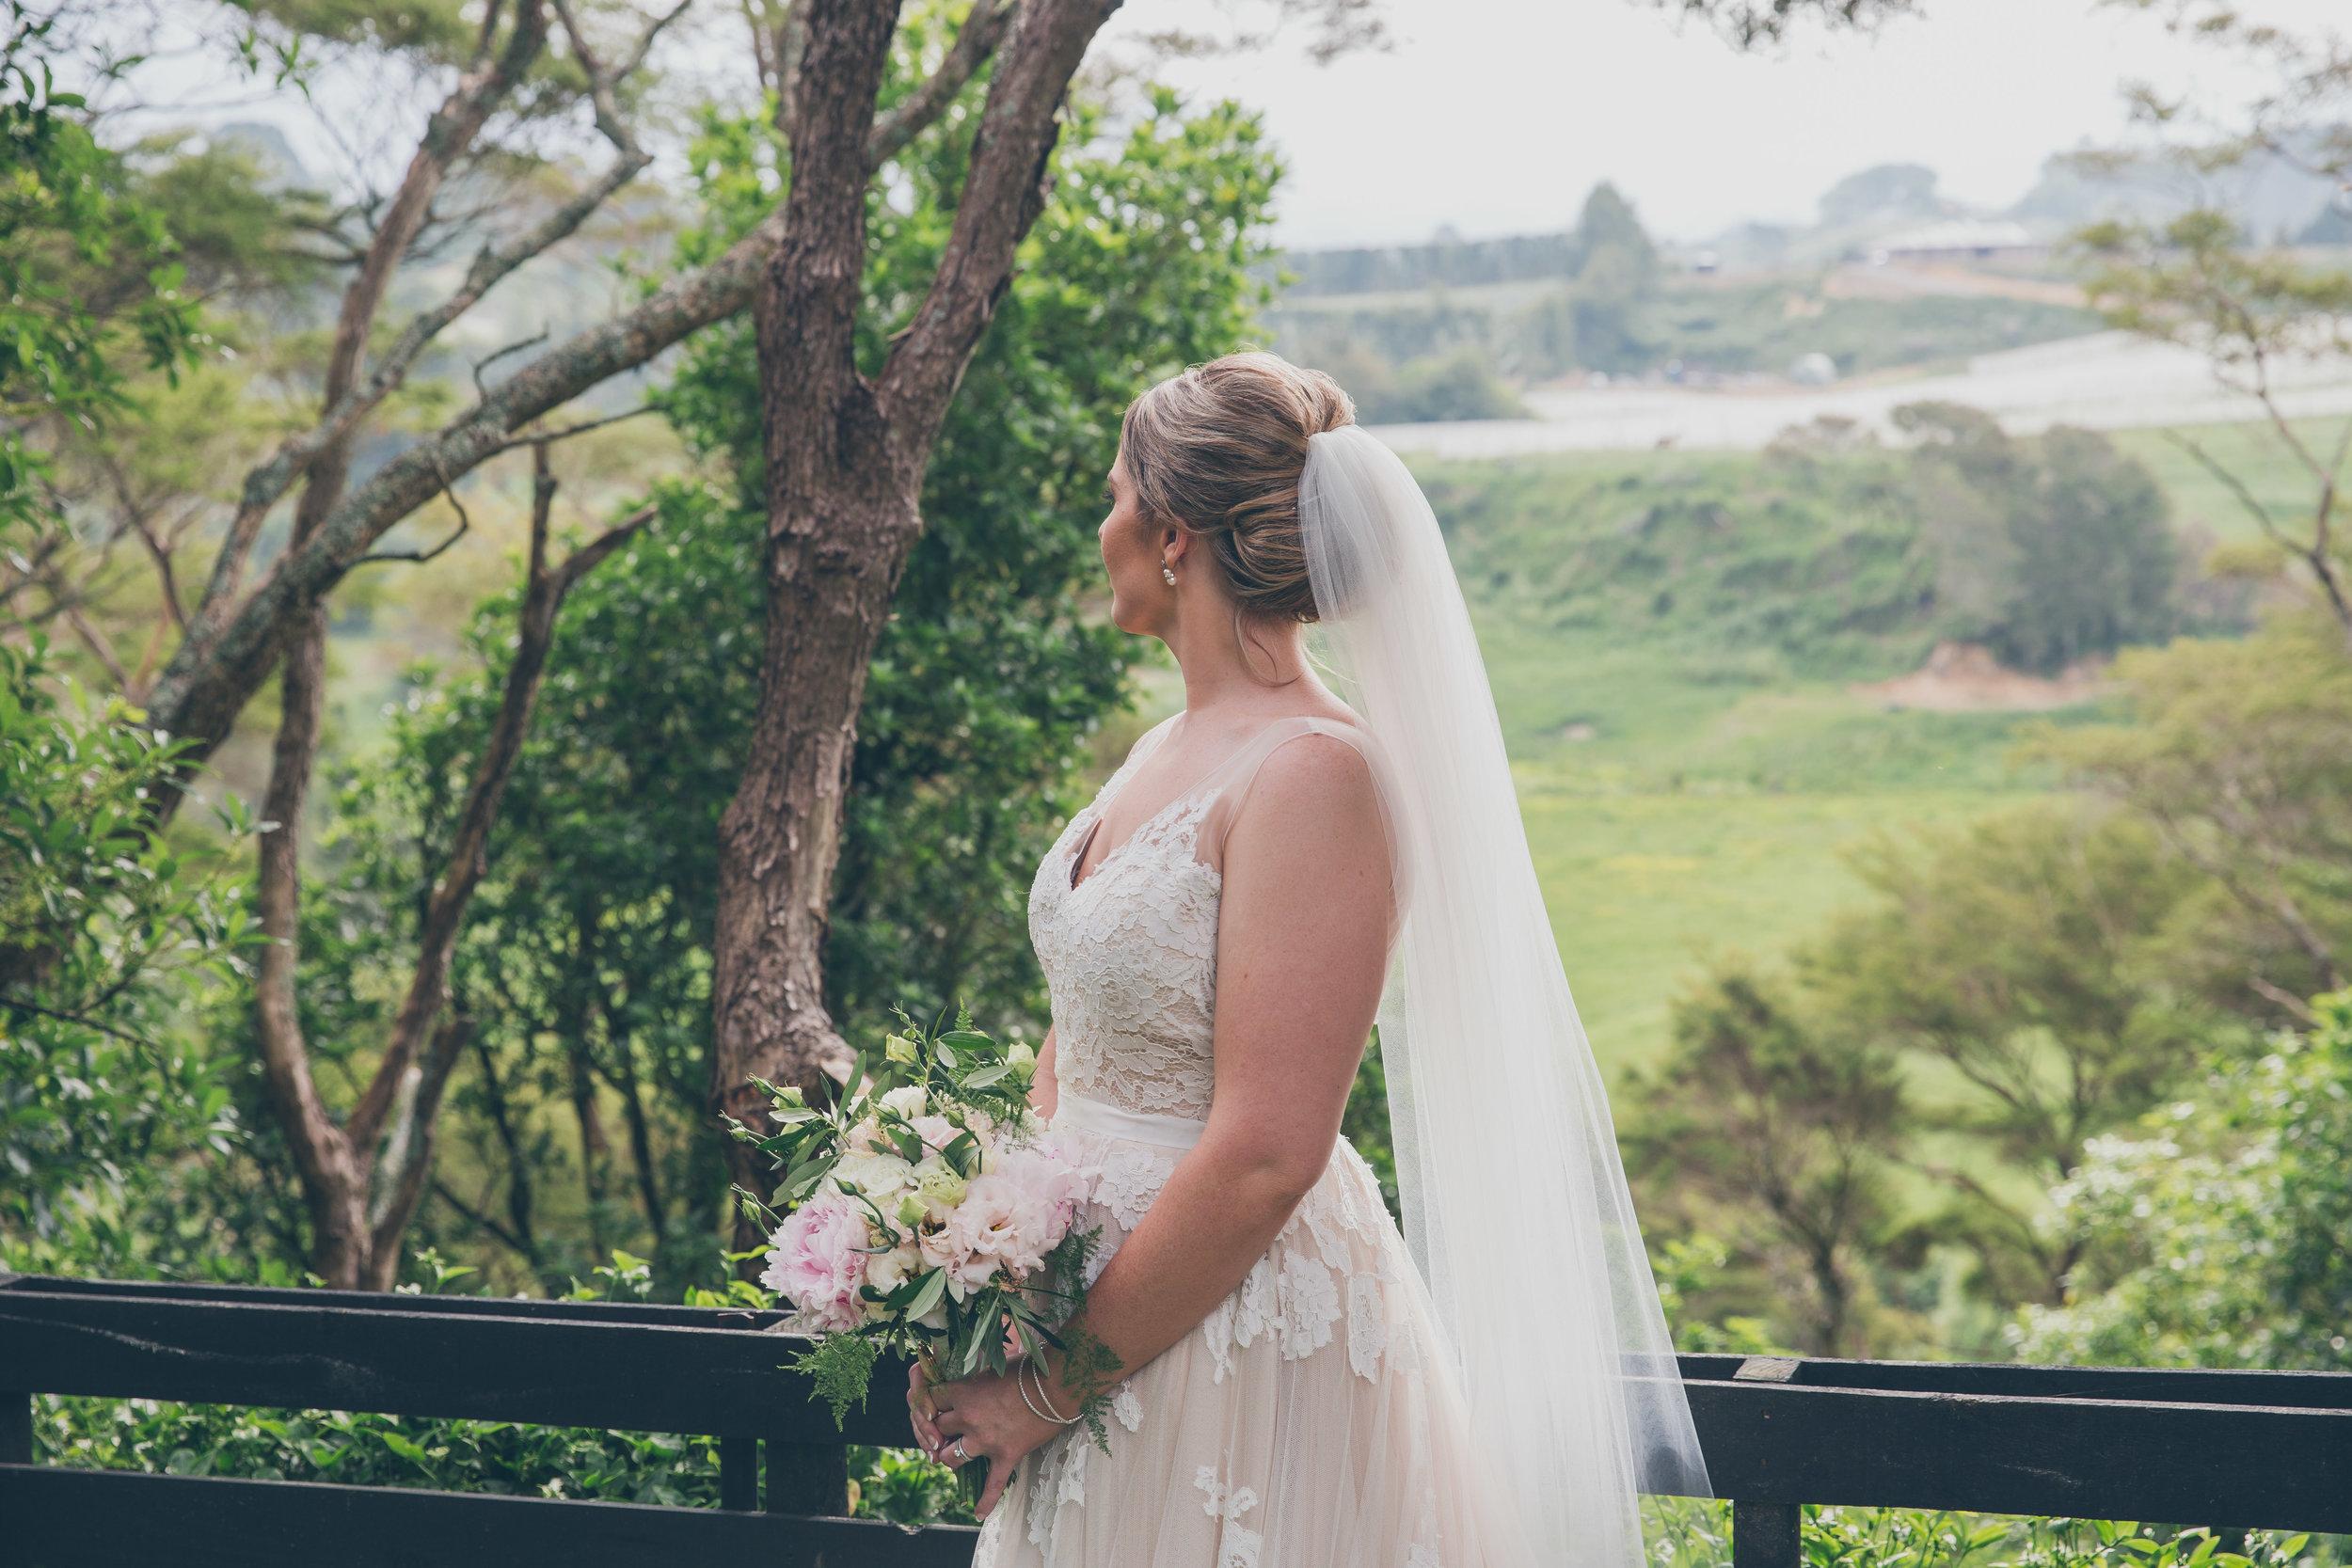 C & J - Wedding - Oh Joy! Photography - Tauranga, New Zealand-6.jpg